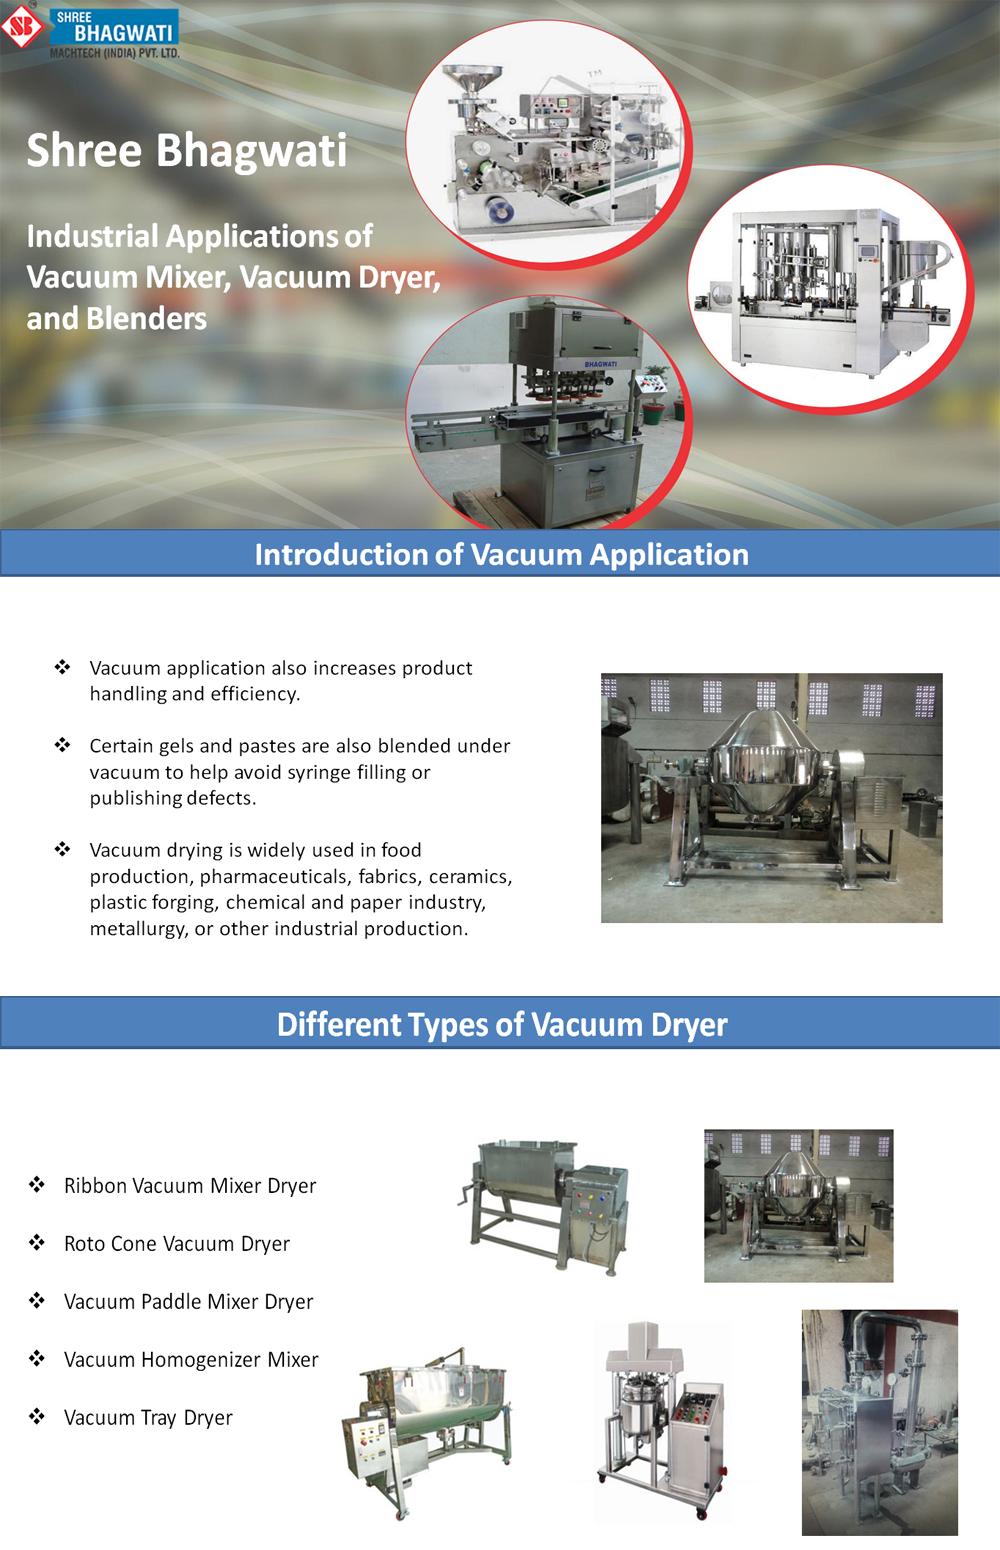 Industrial Applications of Vacuum Mixer, Vacuum Dryer, and Blenders